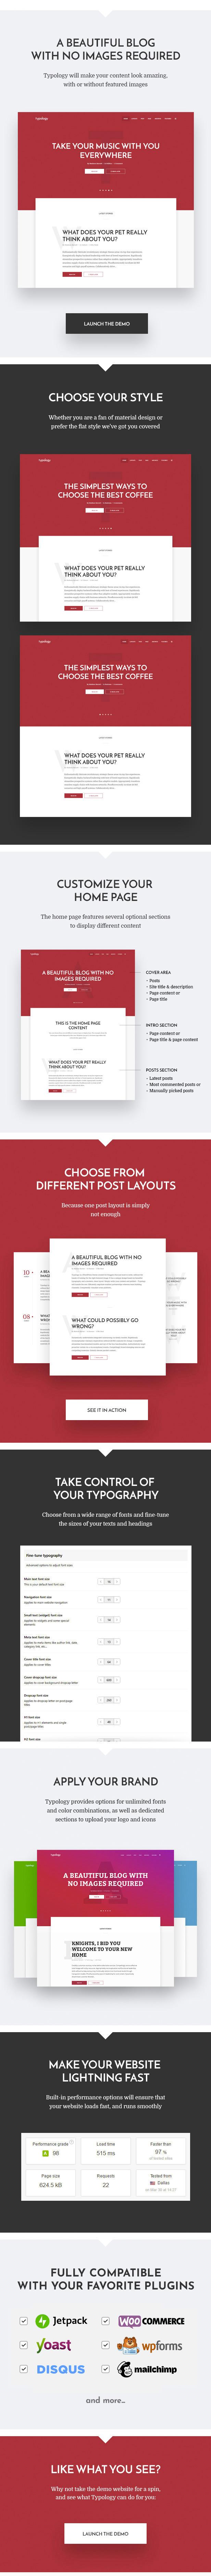 typology features part01 v5 - Typology - Minimalist WordPress Blog & Text Based Theme